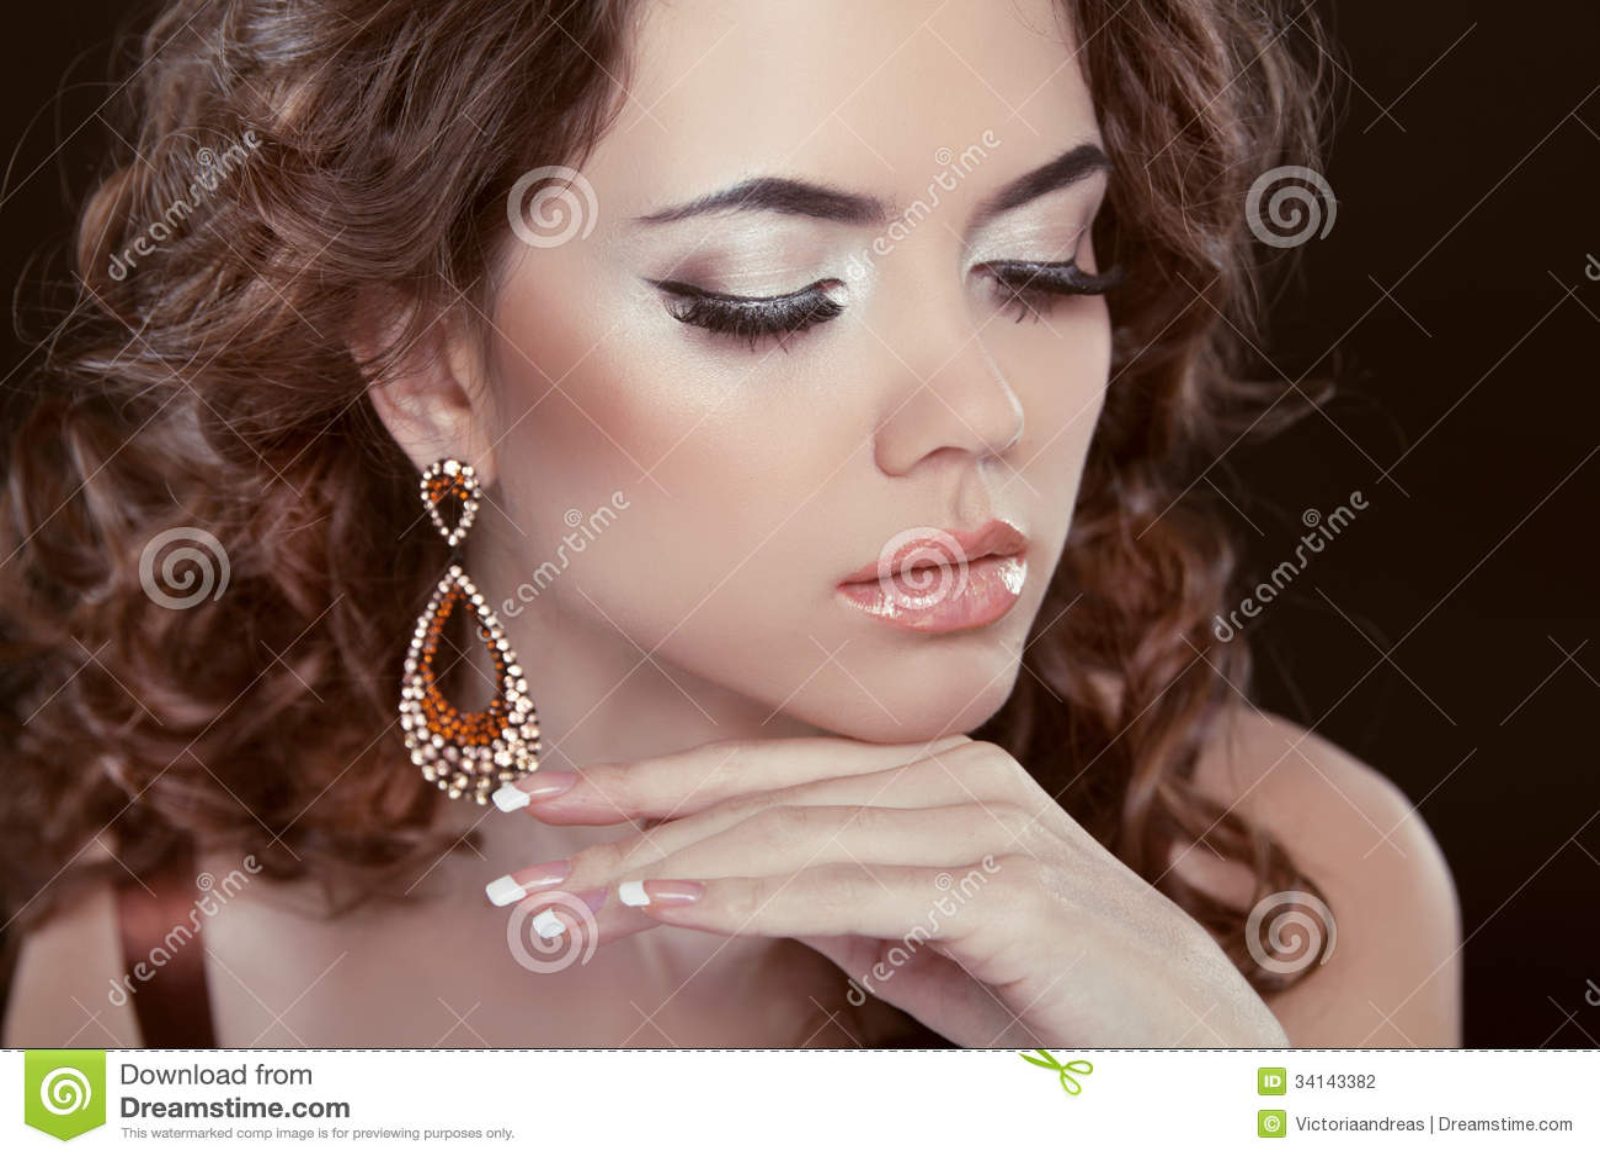 earrings girl hair makeup - photo #20